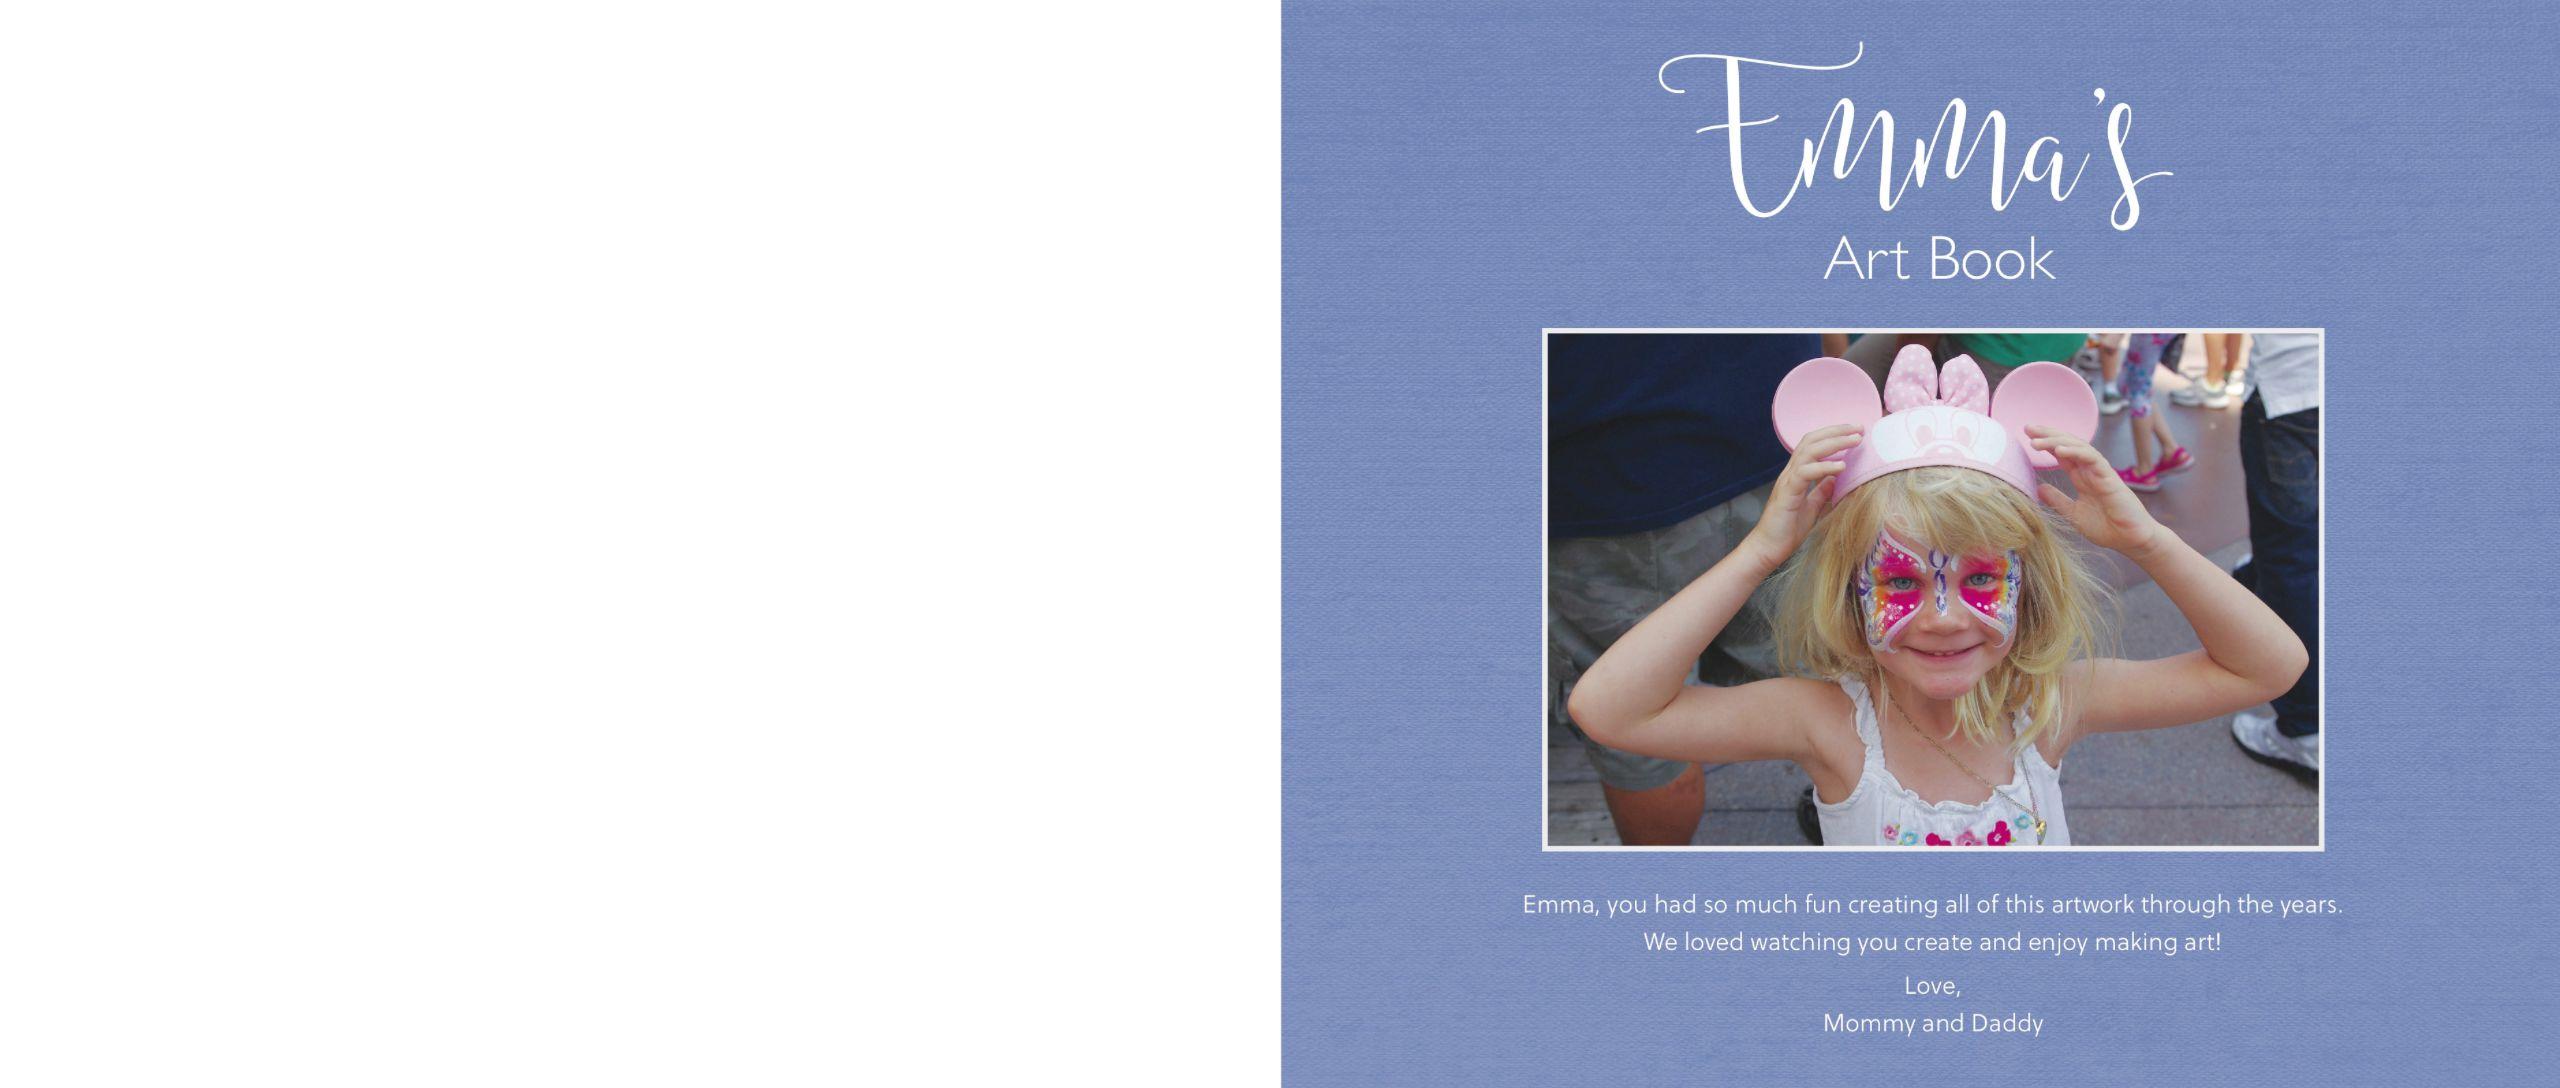 Plum Print Gallery: See our books of children's artwork! | Plum Print